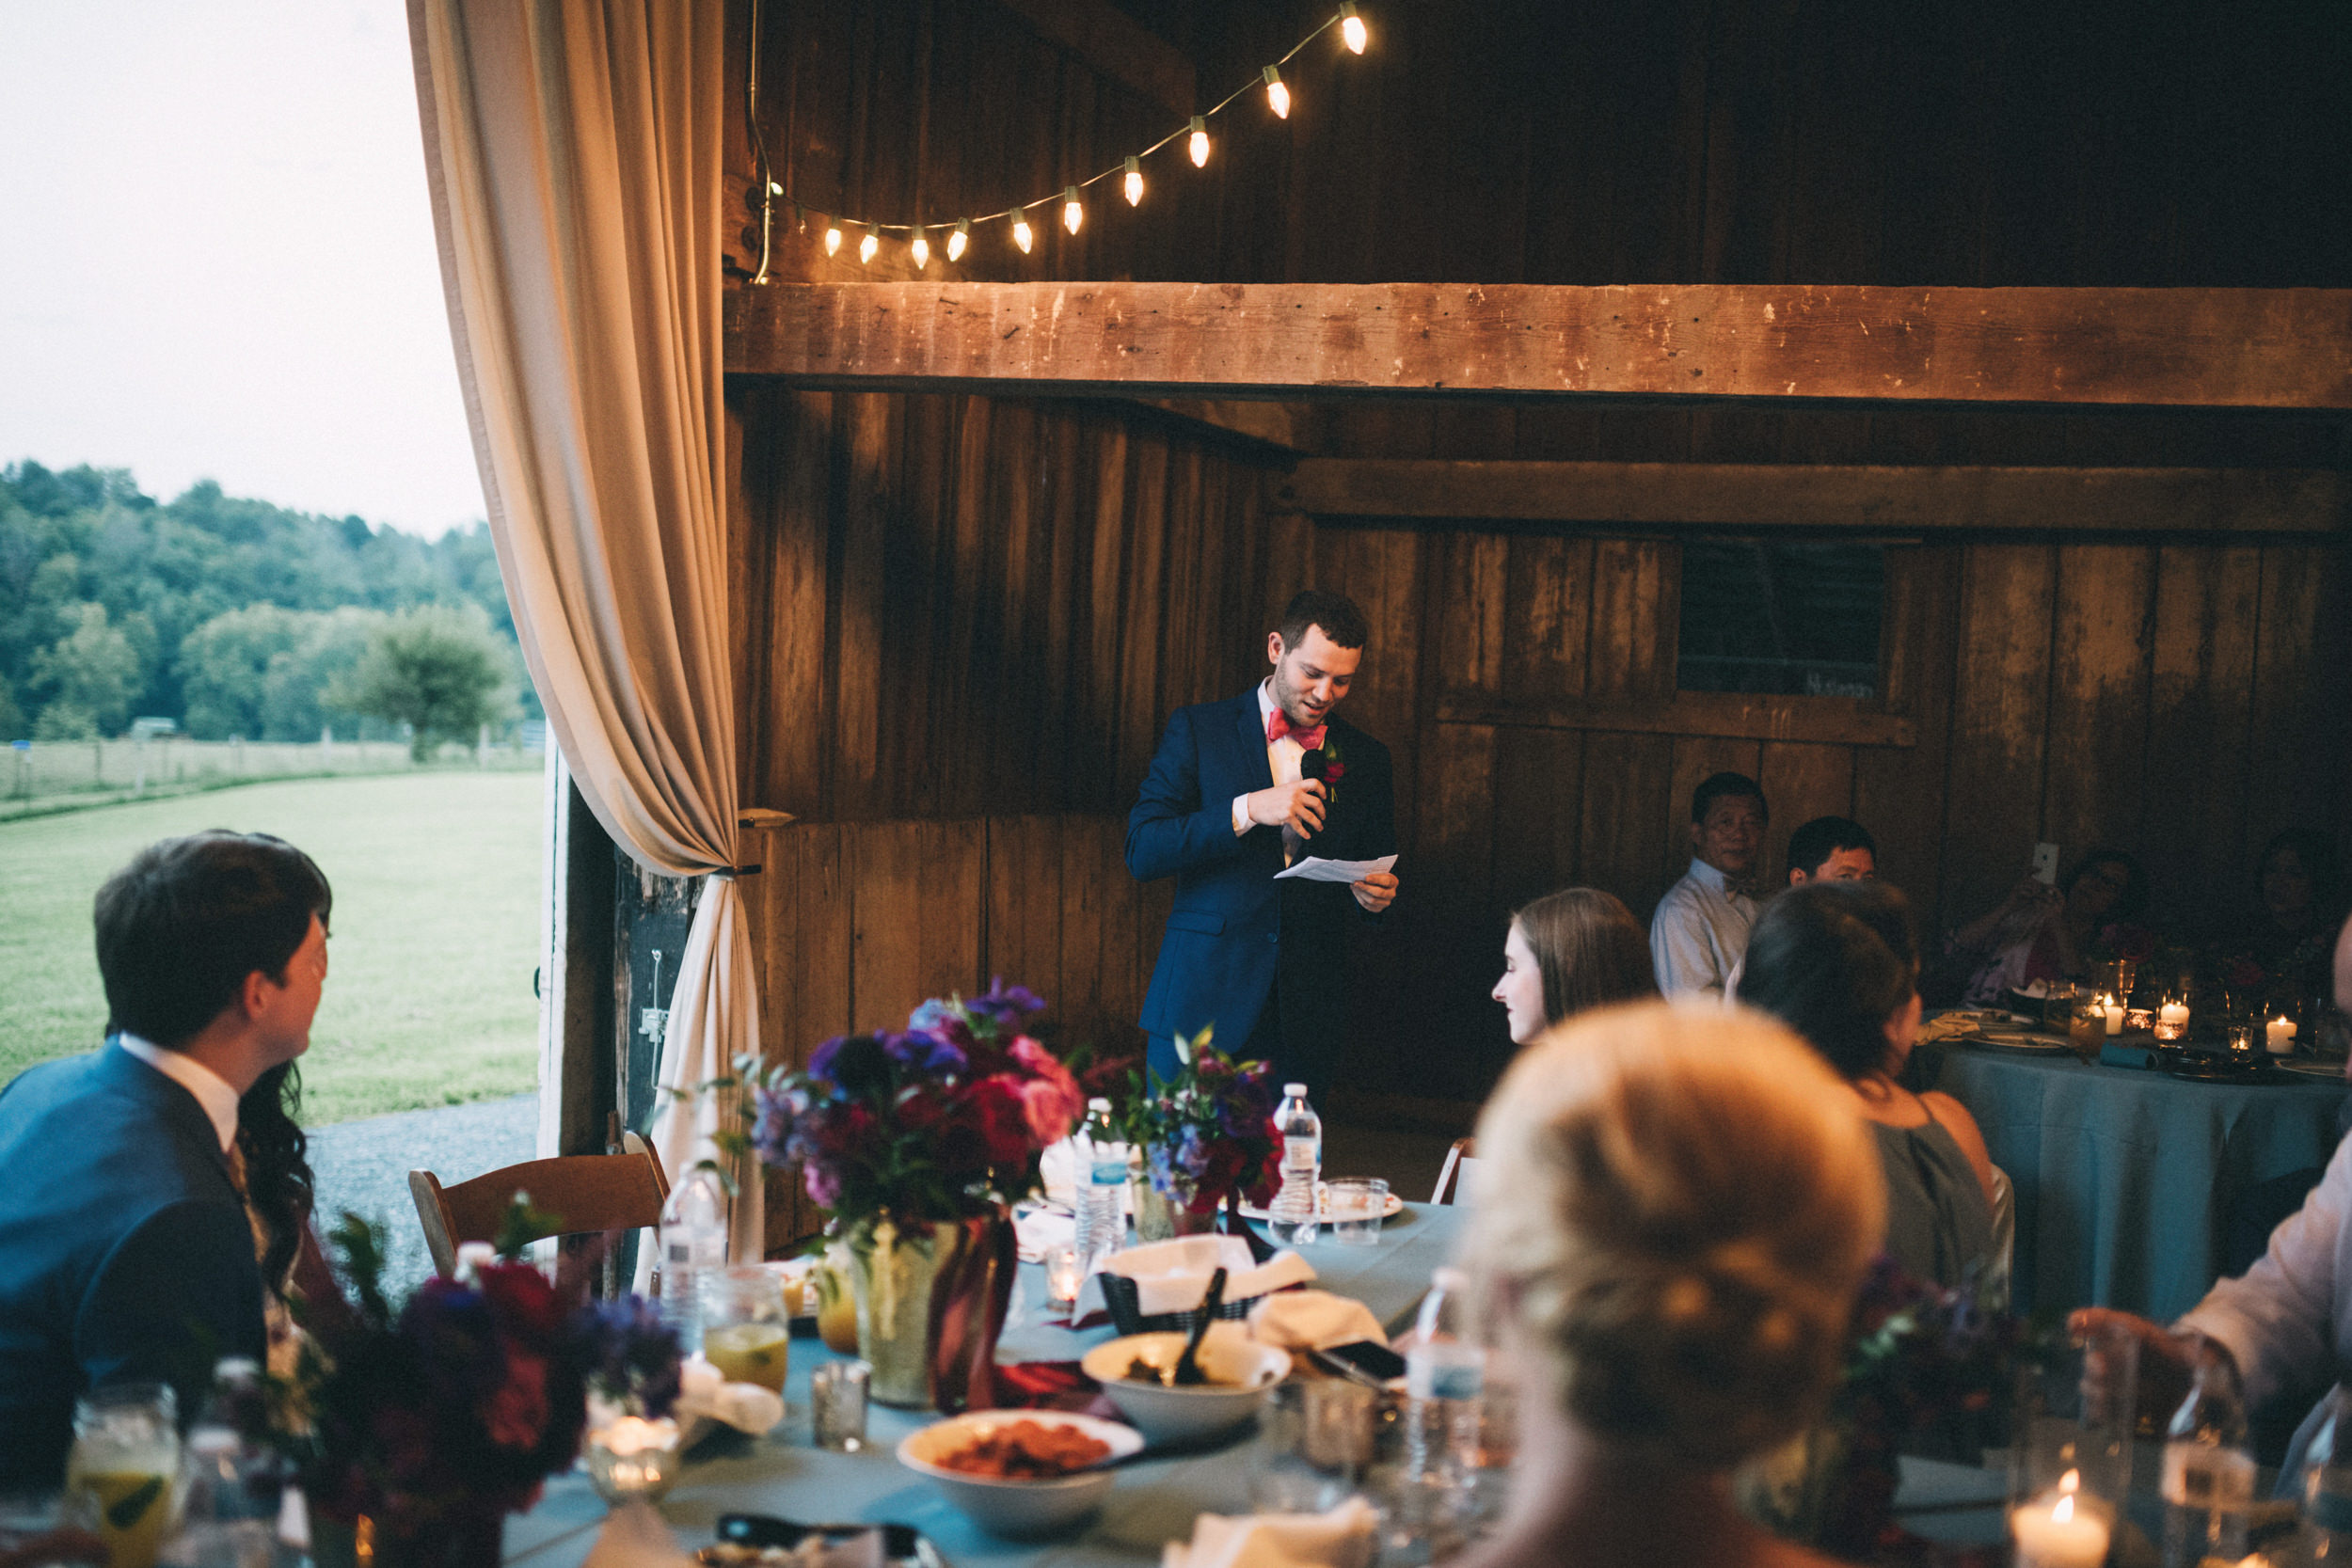 Louisville-Kentucky-Wedding-and-Elopement-Photographer-Sarah-Katherine-Davis-Photography-Summer-Jewel-Toned-Wedding-Chineese-Tea-Ceremony-Warrenwood-Manor-Danville-842.jpg